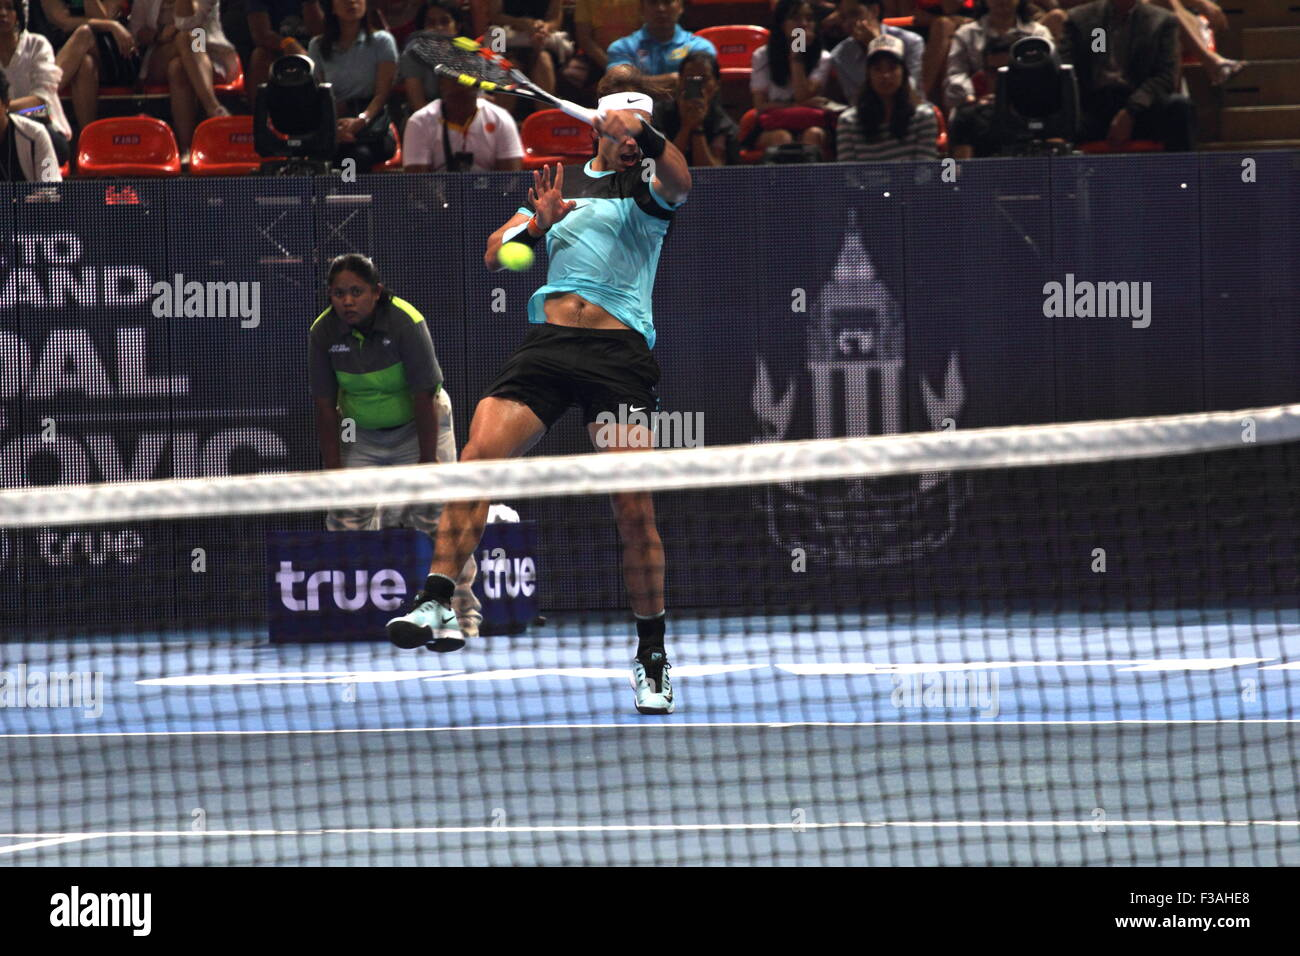 Bangkok, Thailand 02nd Oct 2015. Rafael Nadal of Spain in actions during the Rafael Nadal v Novak Djokovic exhibition - Stock Image